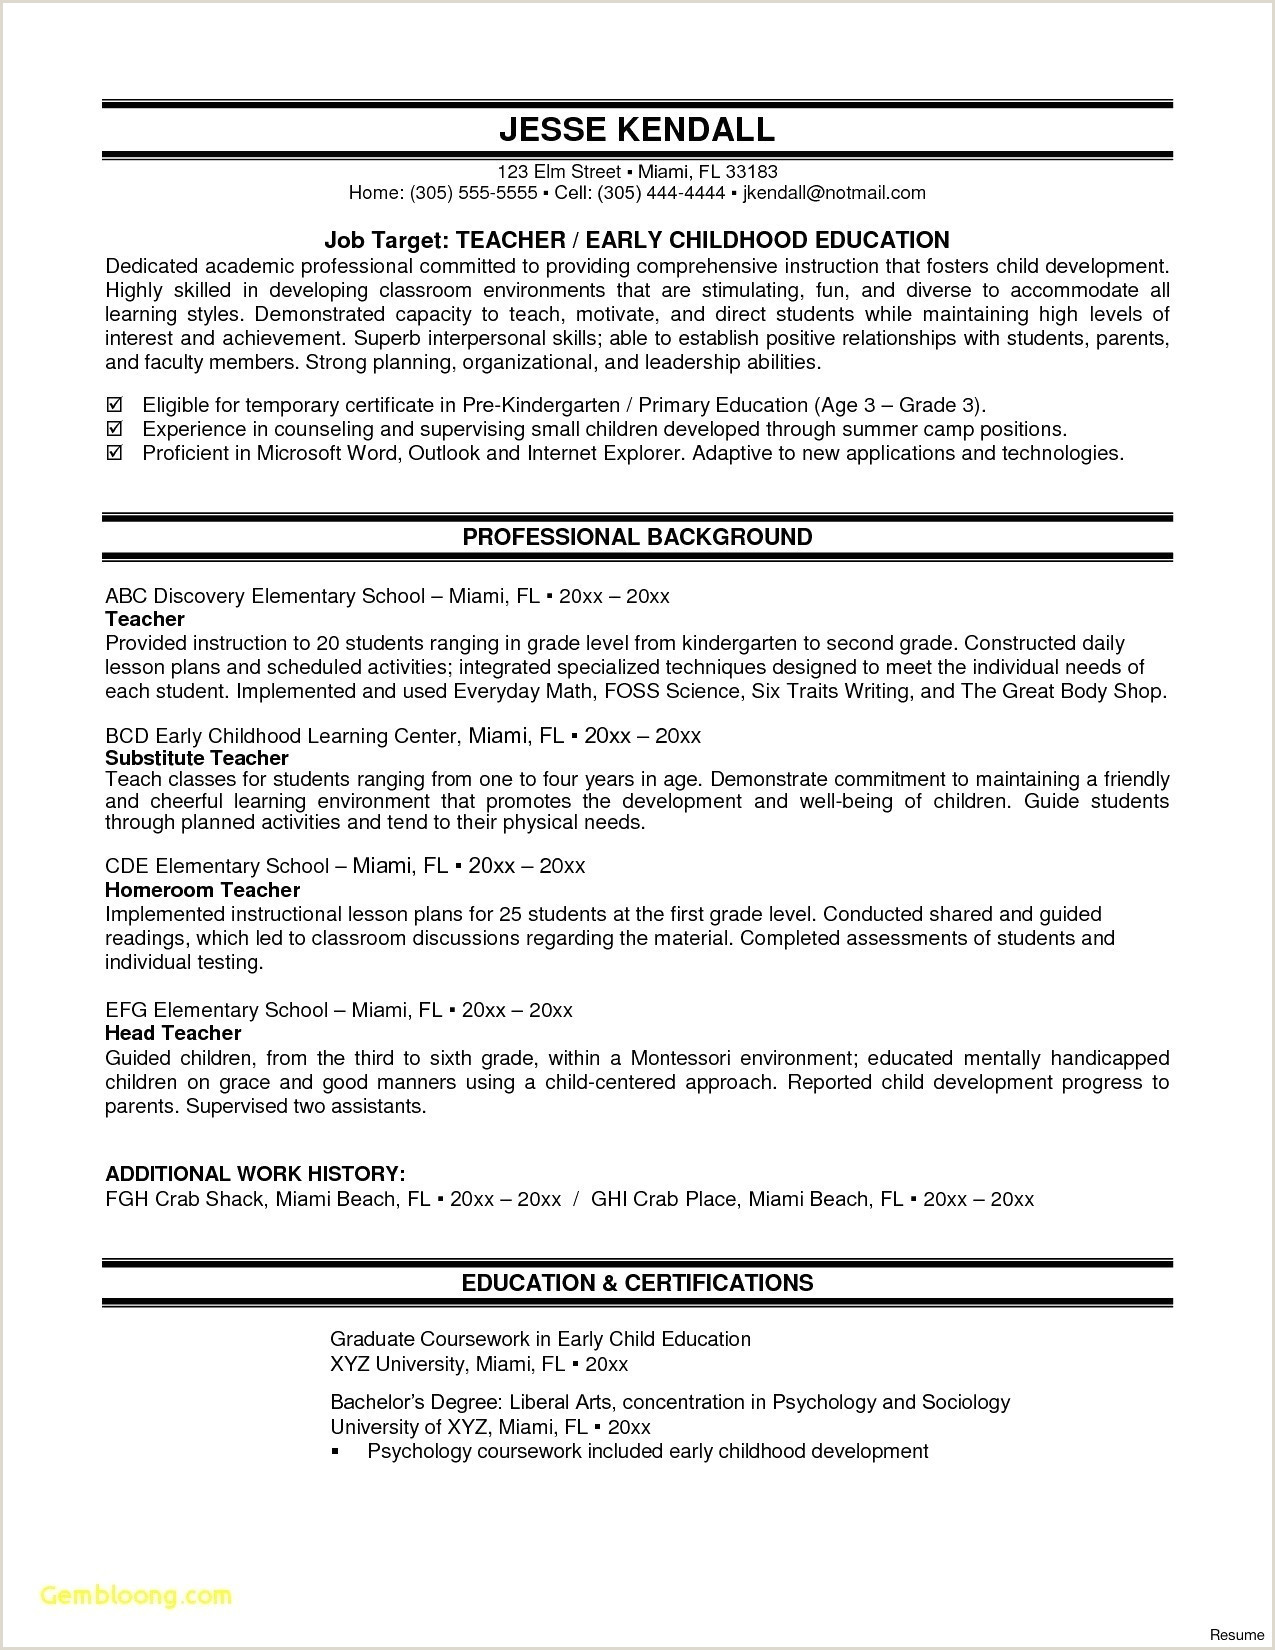 Sample Resume For Teacher Fresh Graduate New Awesome Cover